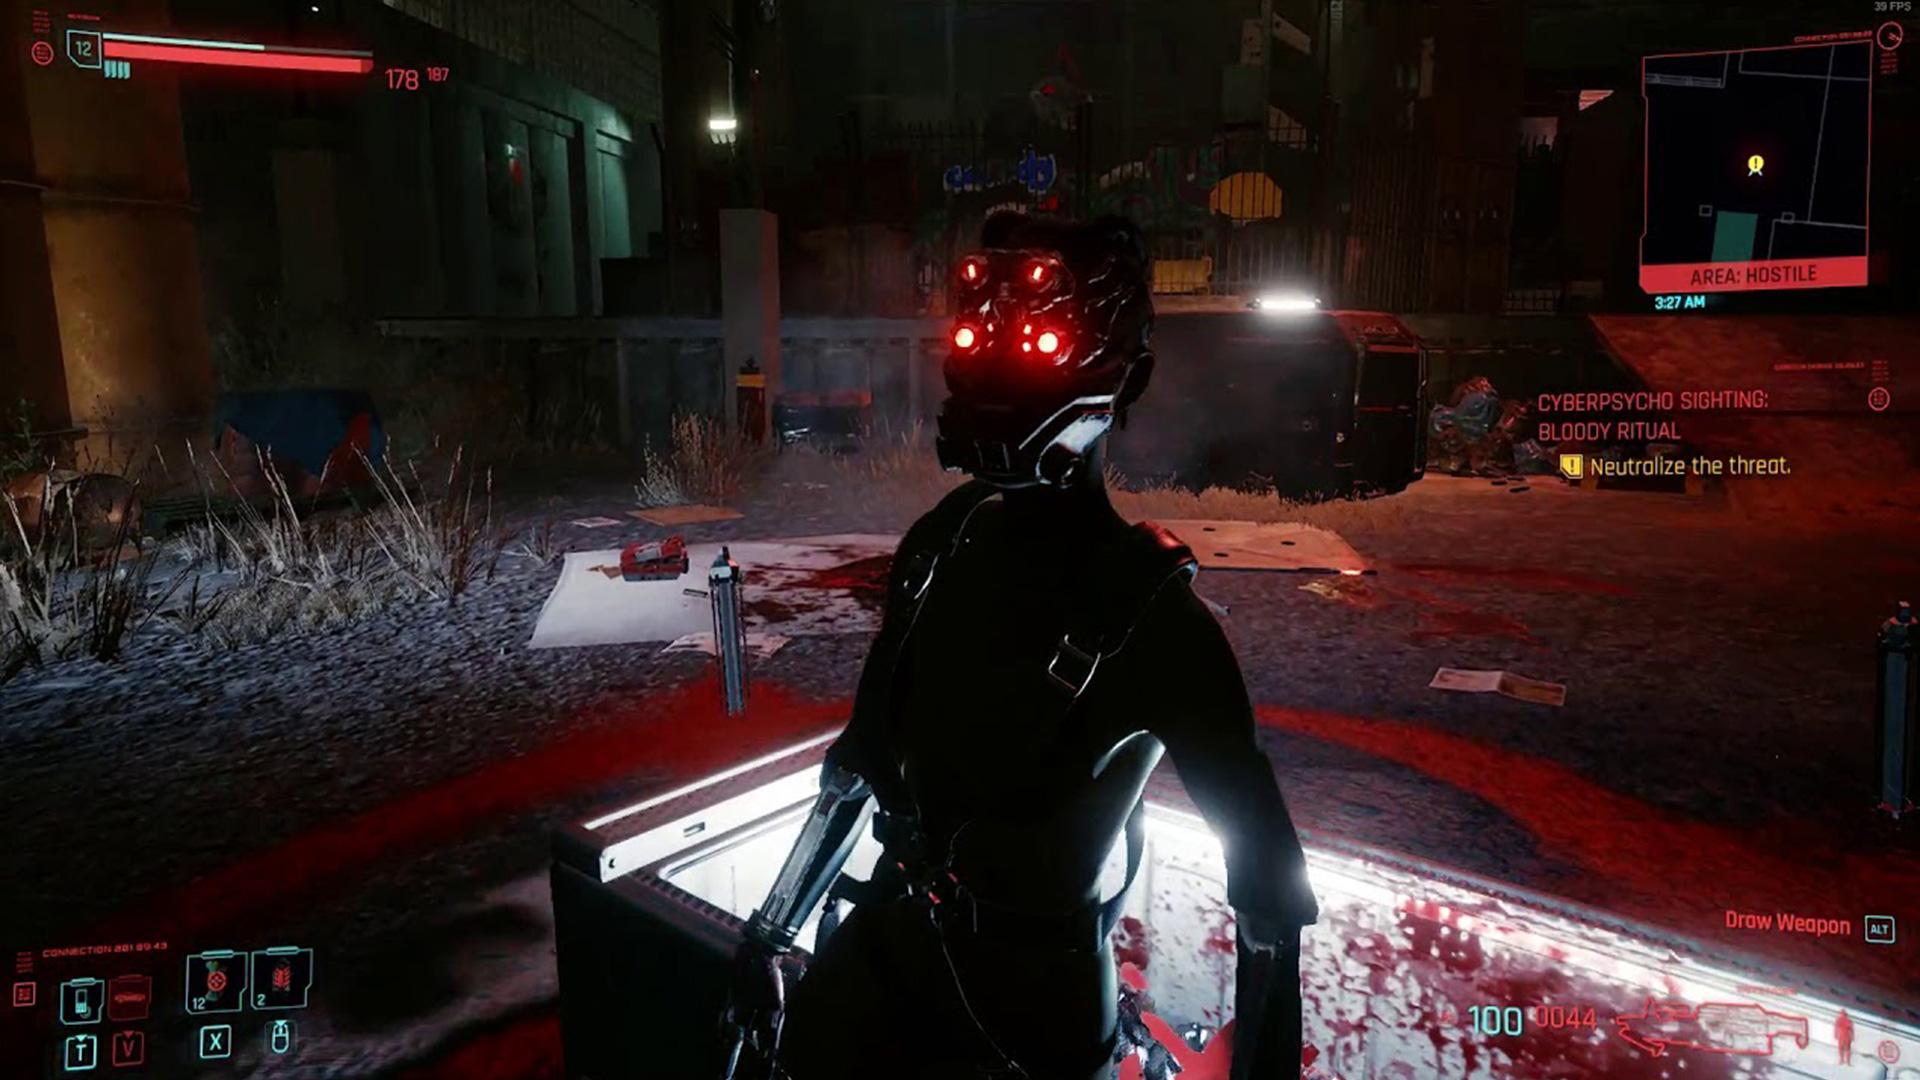 Comment casser le fragment rituel dans Cyberpunk 2077